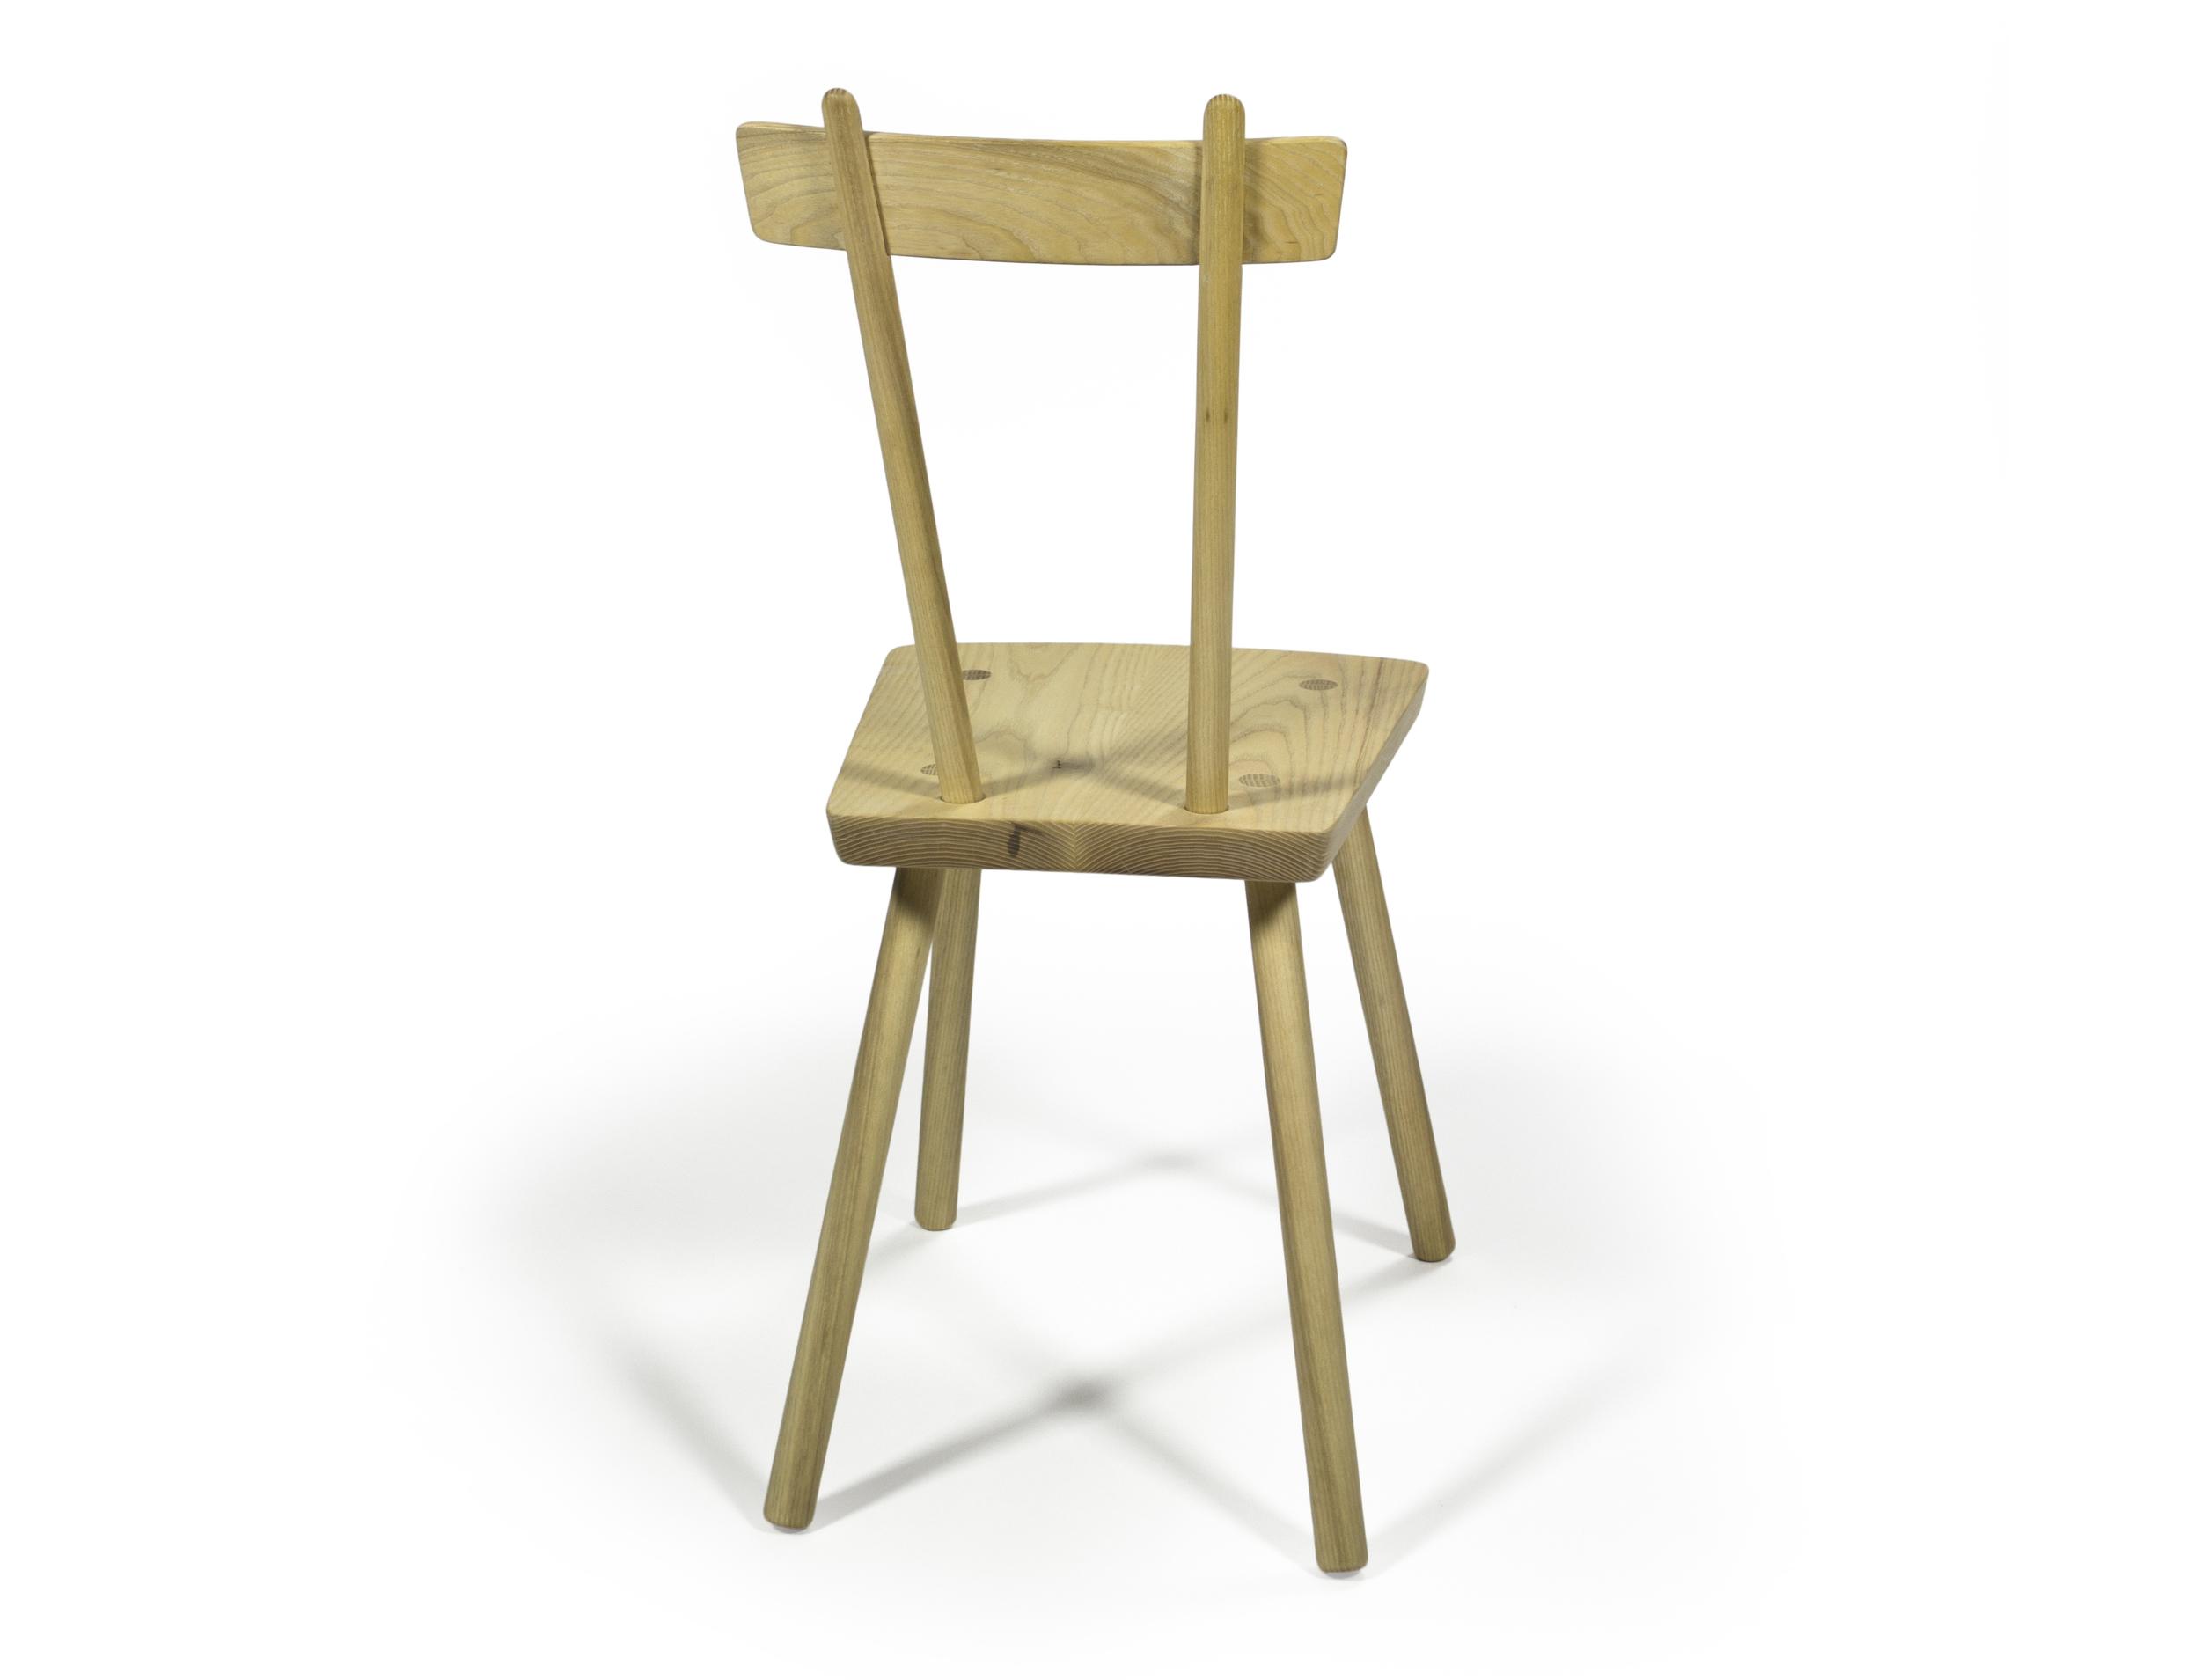 chair_backcrop.jpg